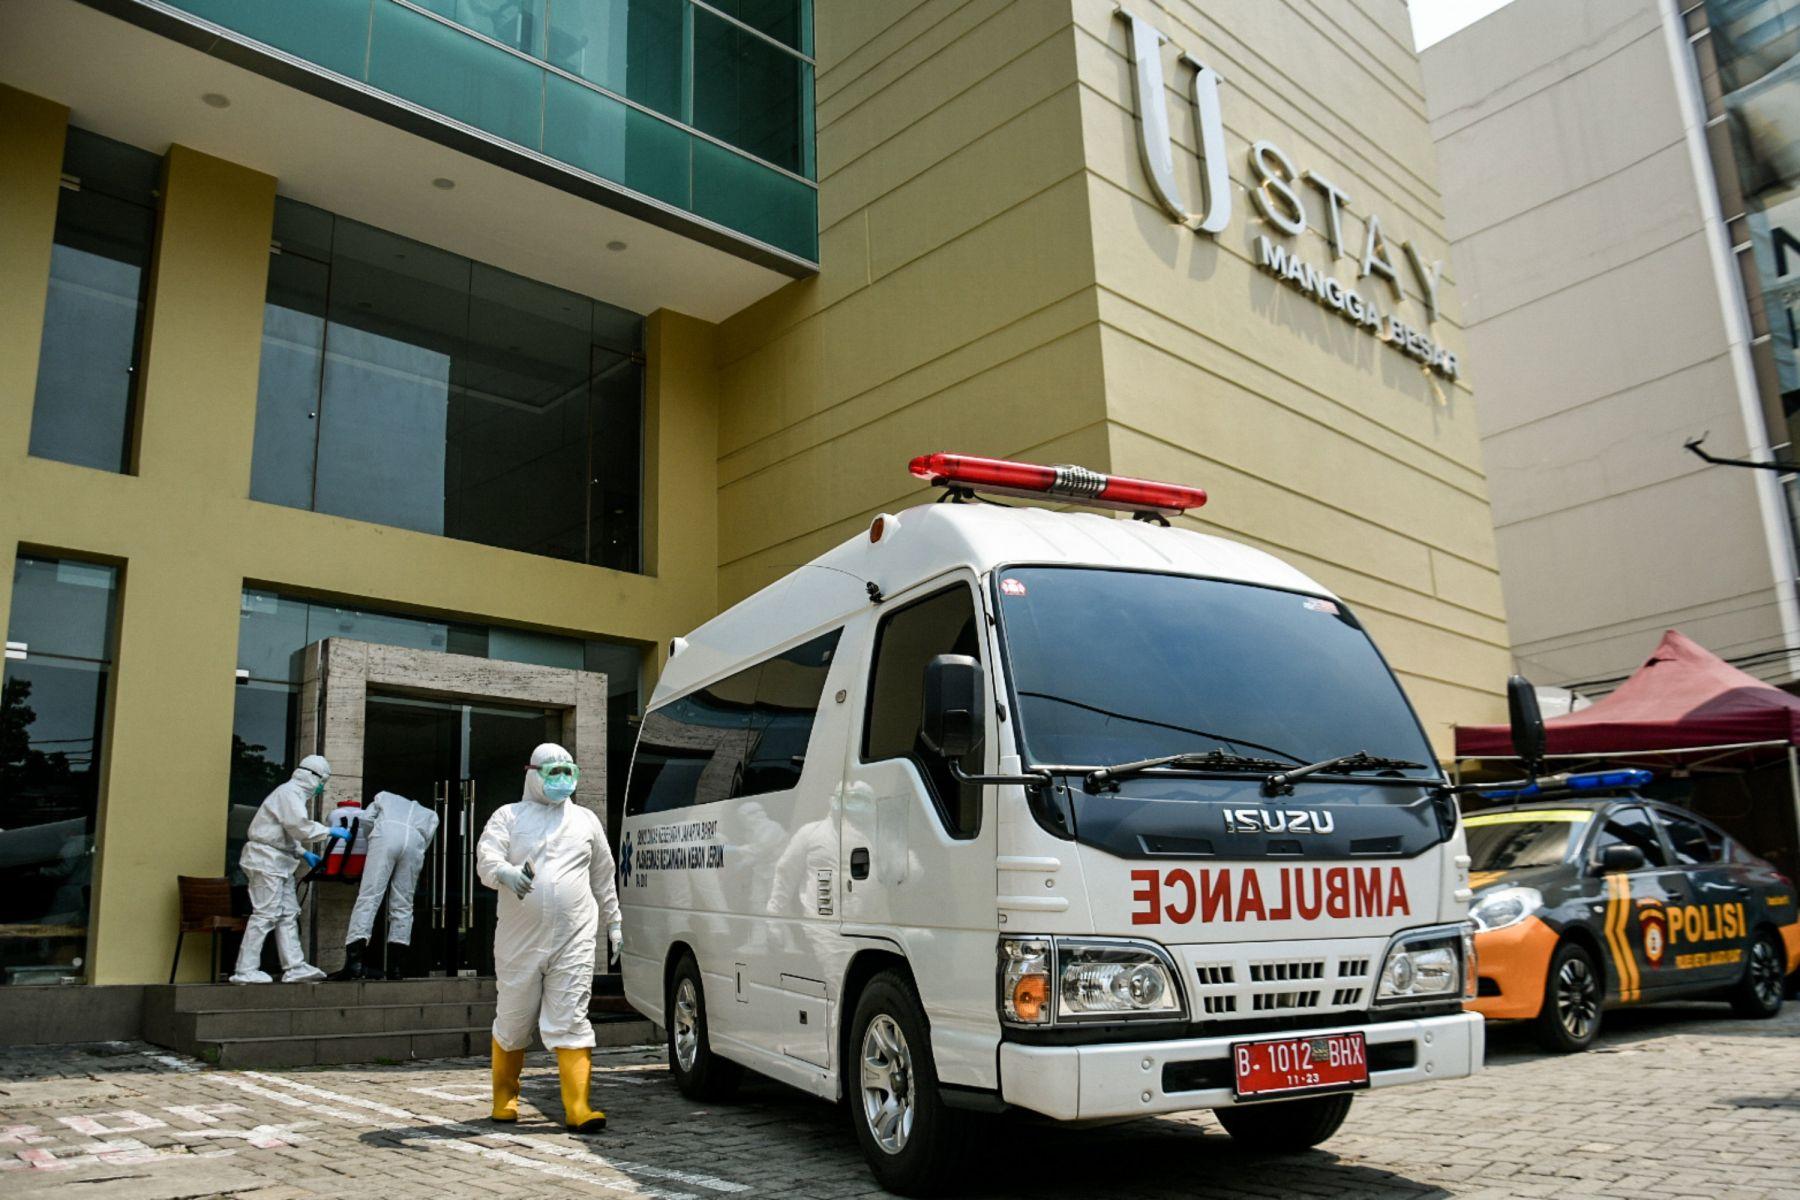 Ada 2 Hotel Untuk Isolasi Mandiri Di Dki Jakarta Ini Prosedurnya